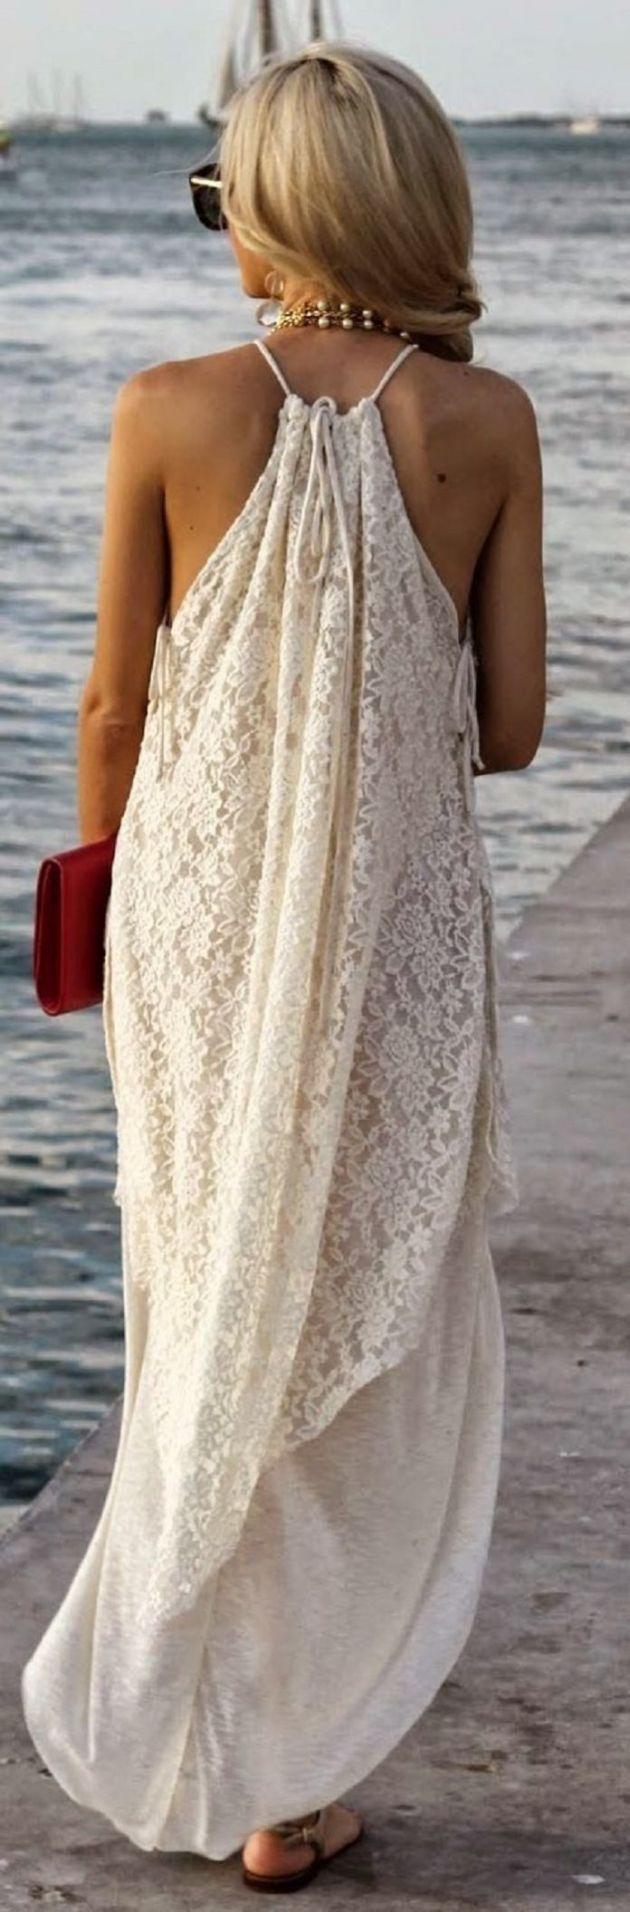 best clothes images on pinterest feminine fashion color